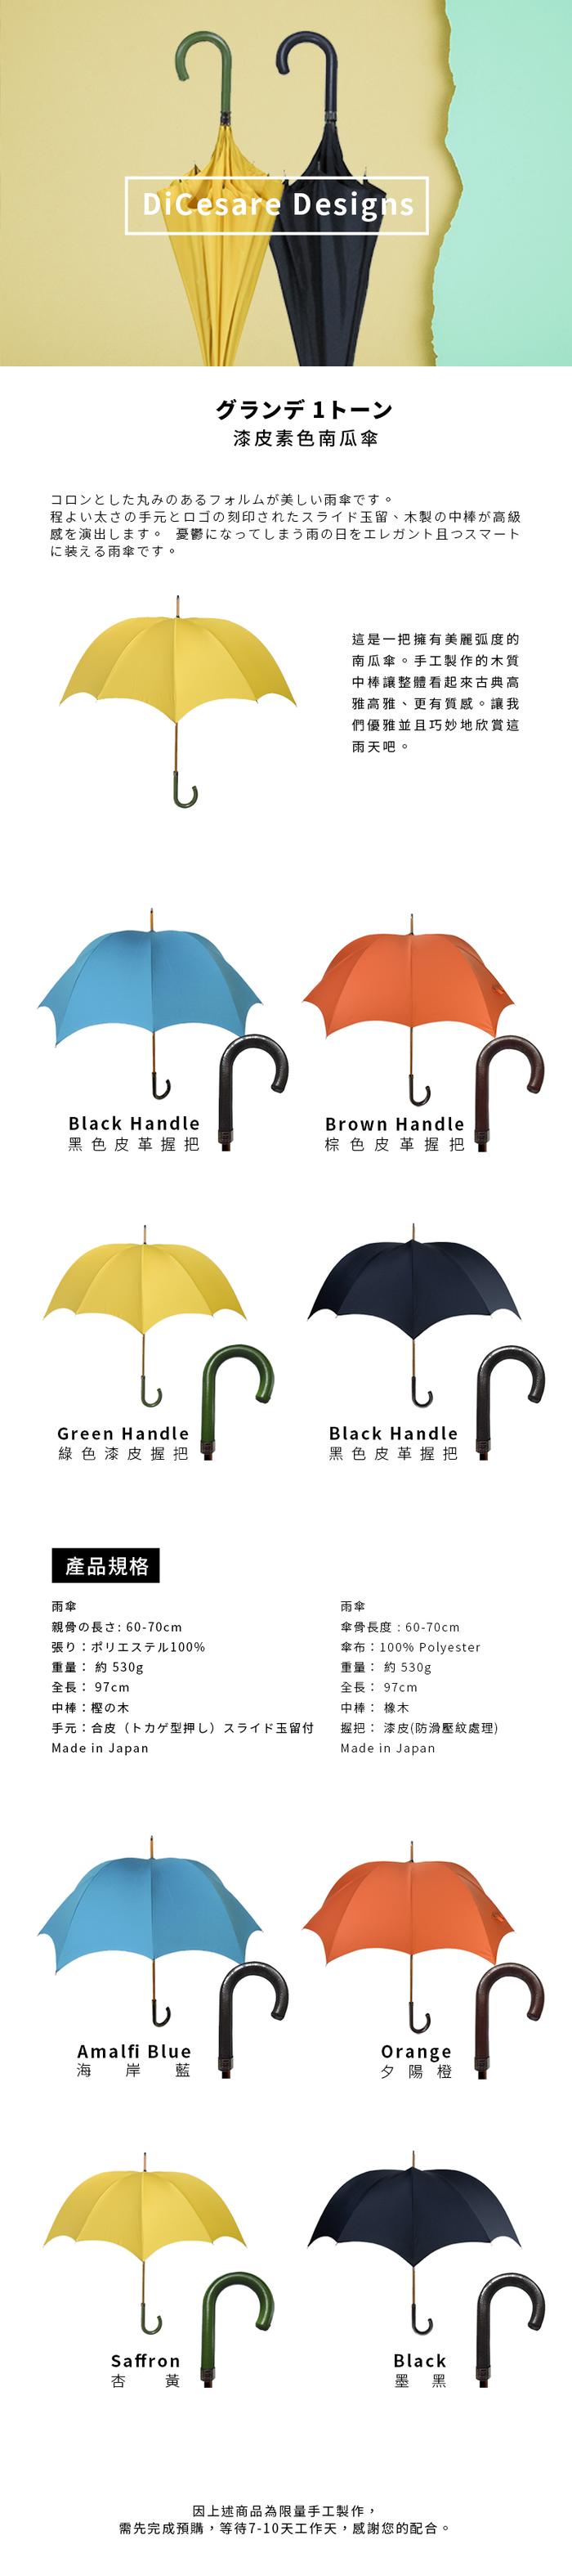 DiCesare|GRANDE 1tone 漆皮素色南瓜傘-海岸藍(黑色皮革握把)